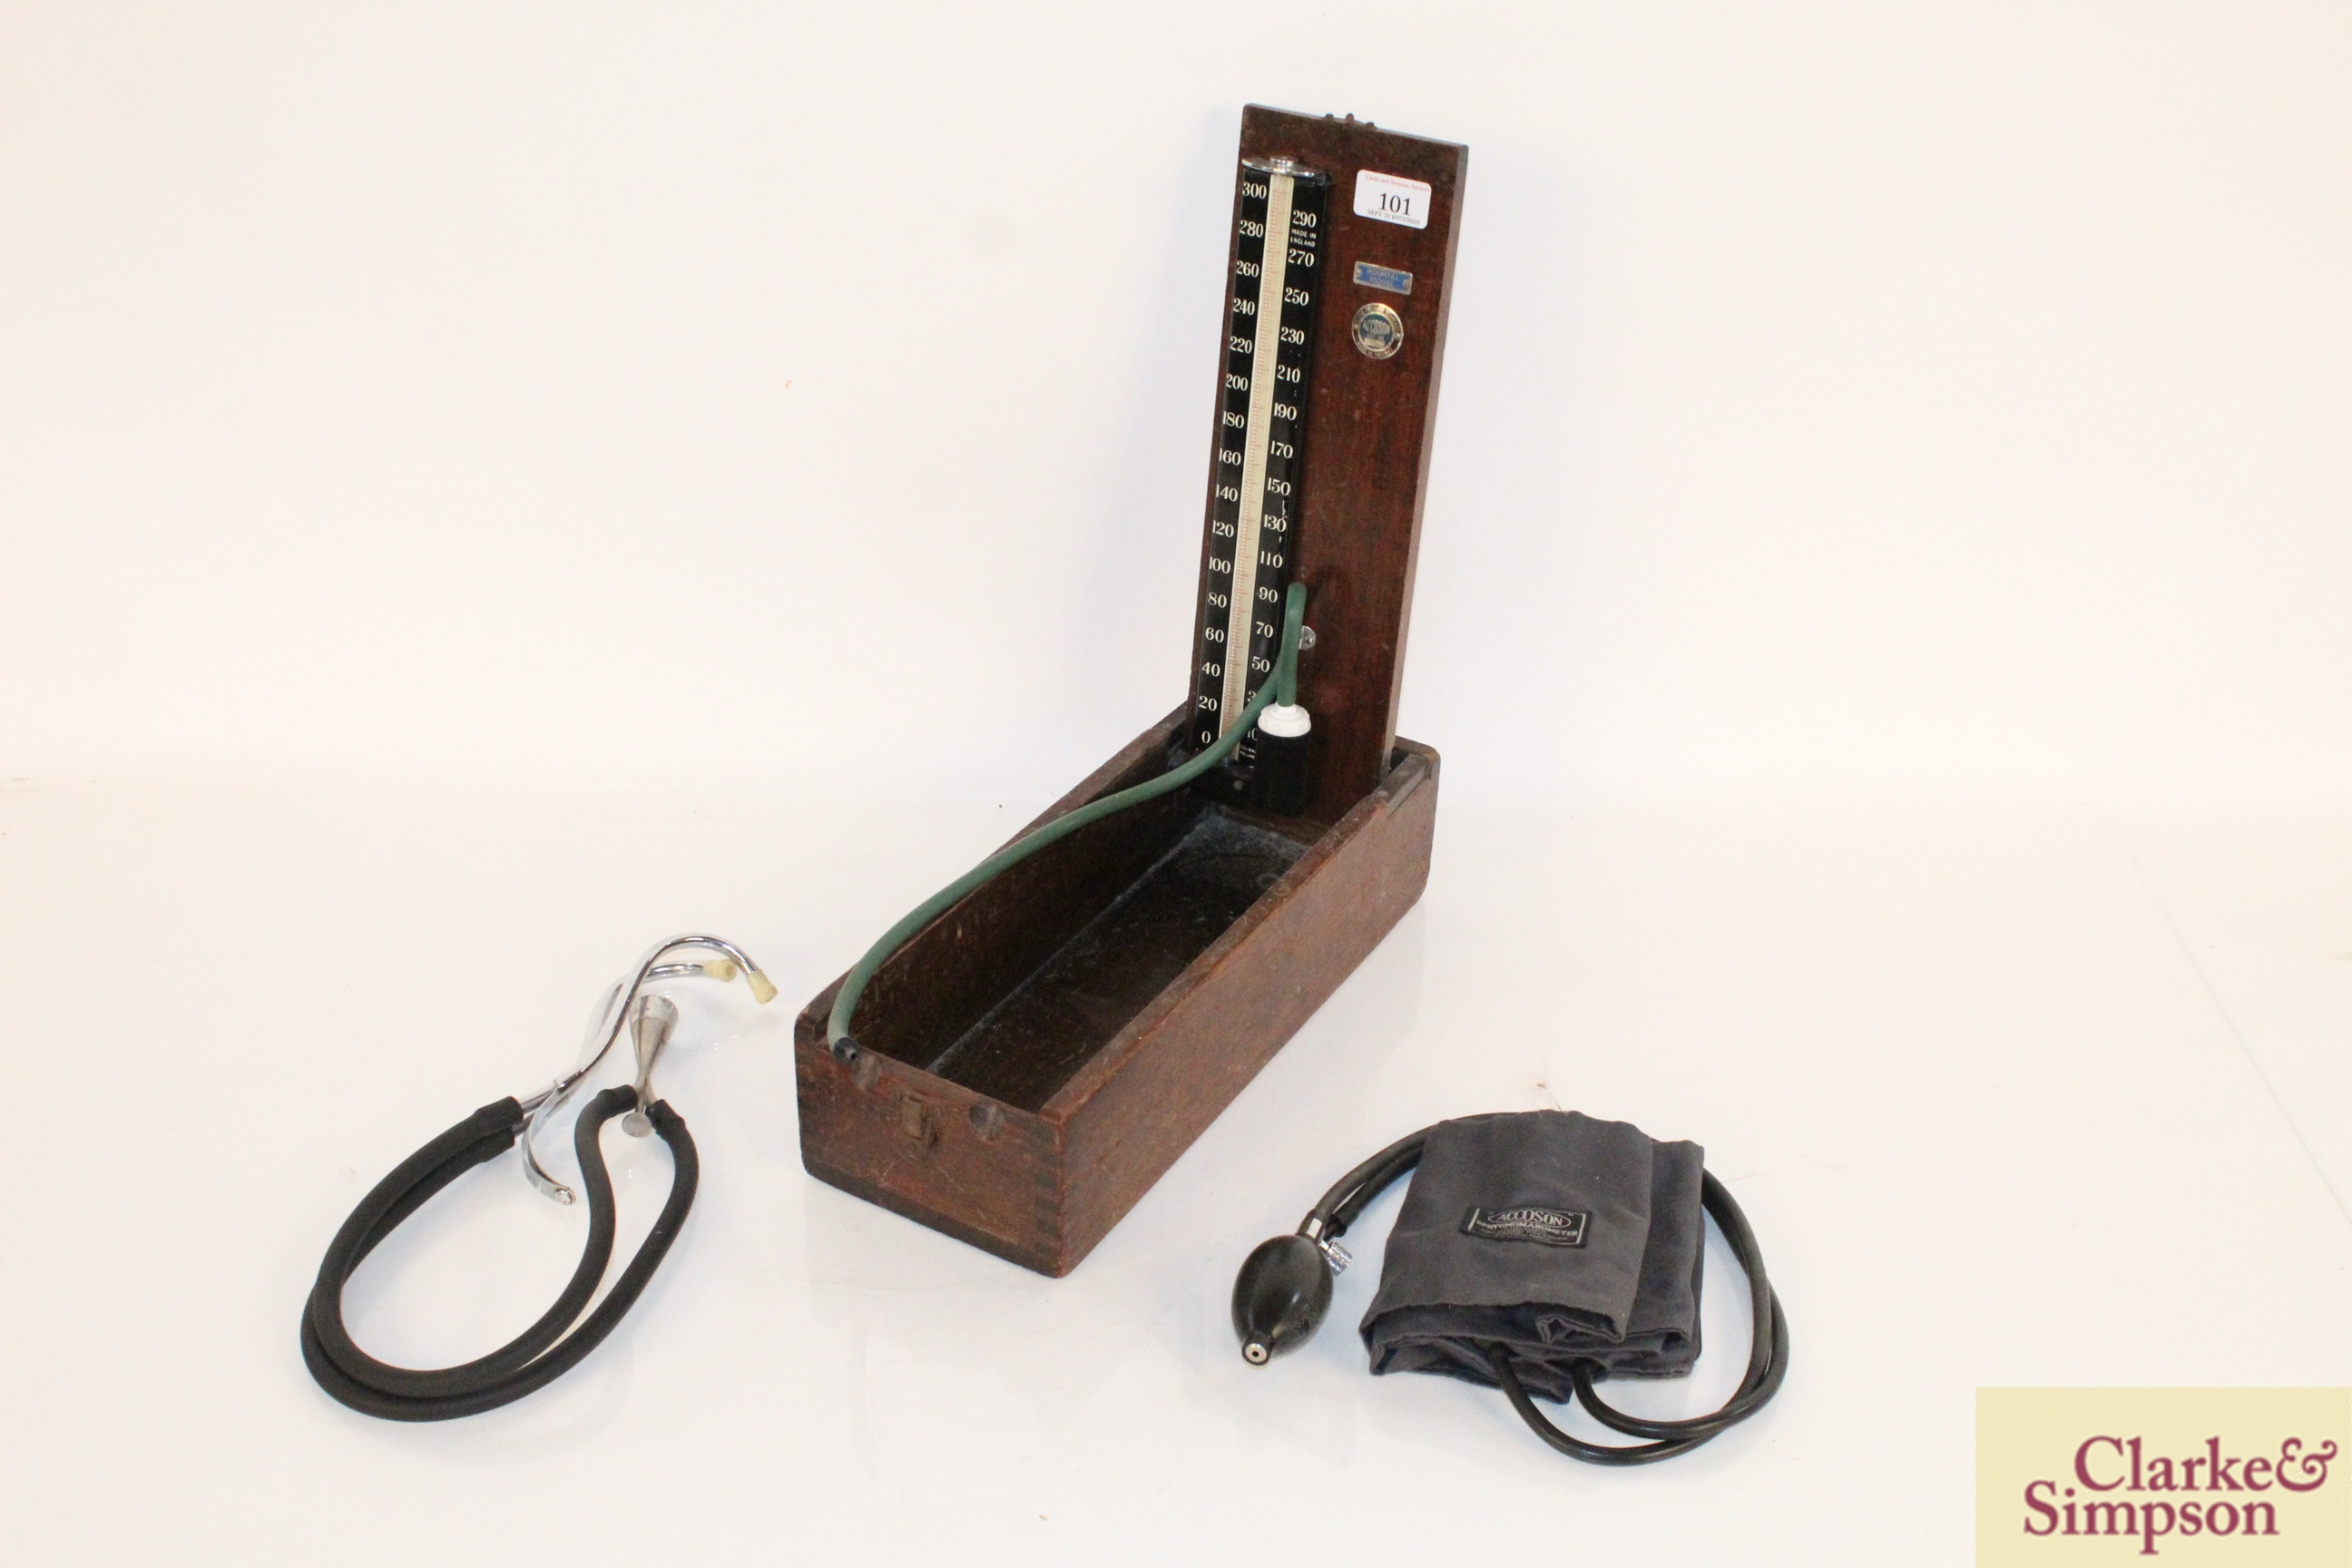 A vintage wooden boxed blood pressure gauge by Accos - Image 2 of 9